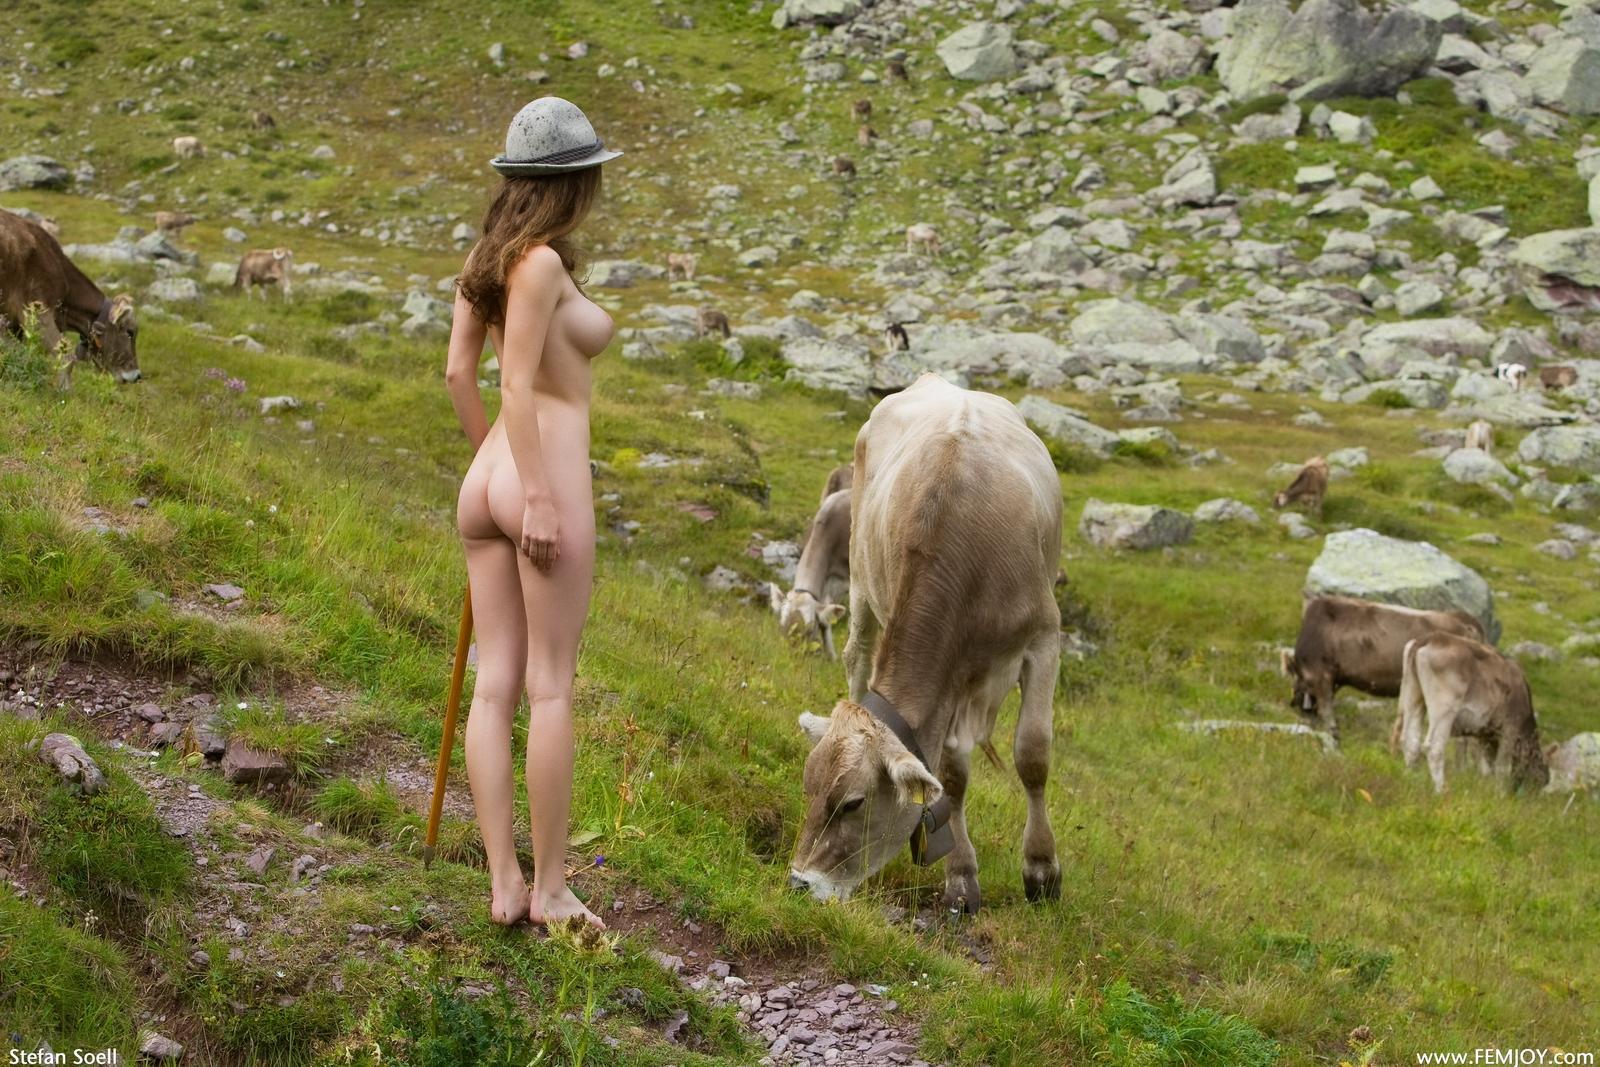 susann-tits-cowgirl-hat-shepherd-naked-femjoy-12